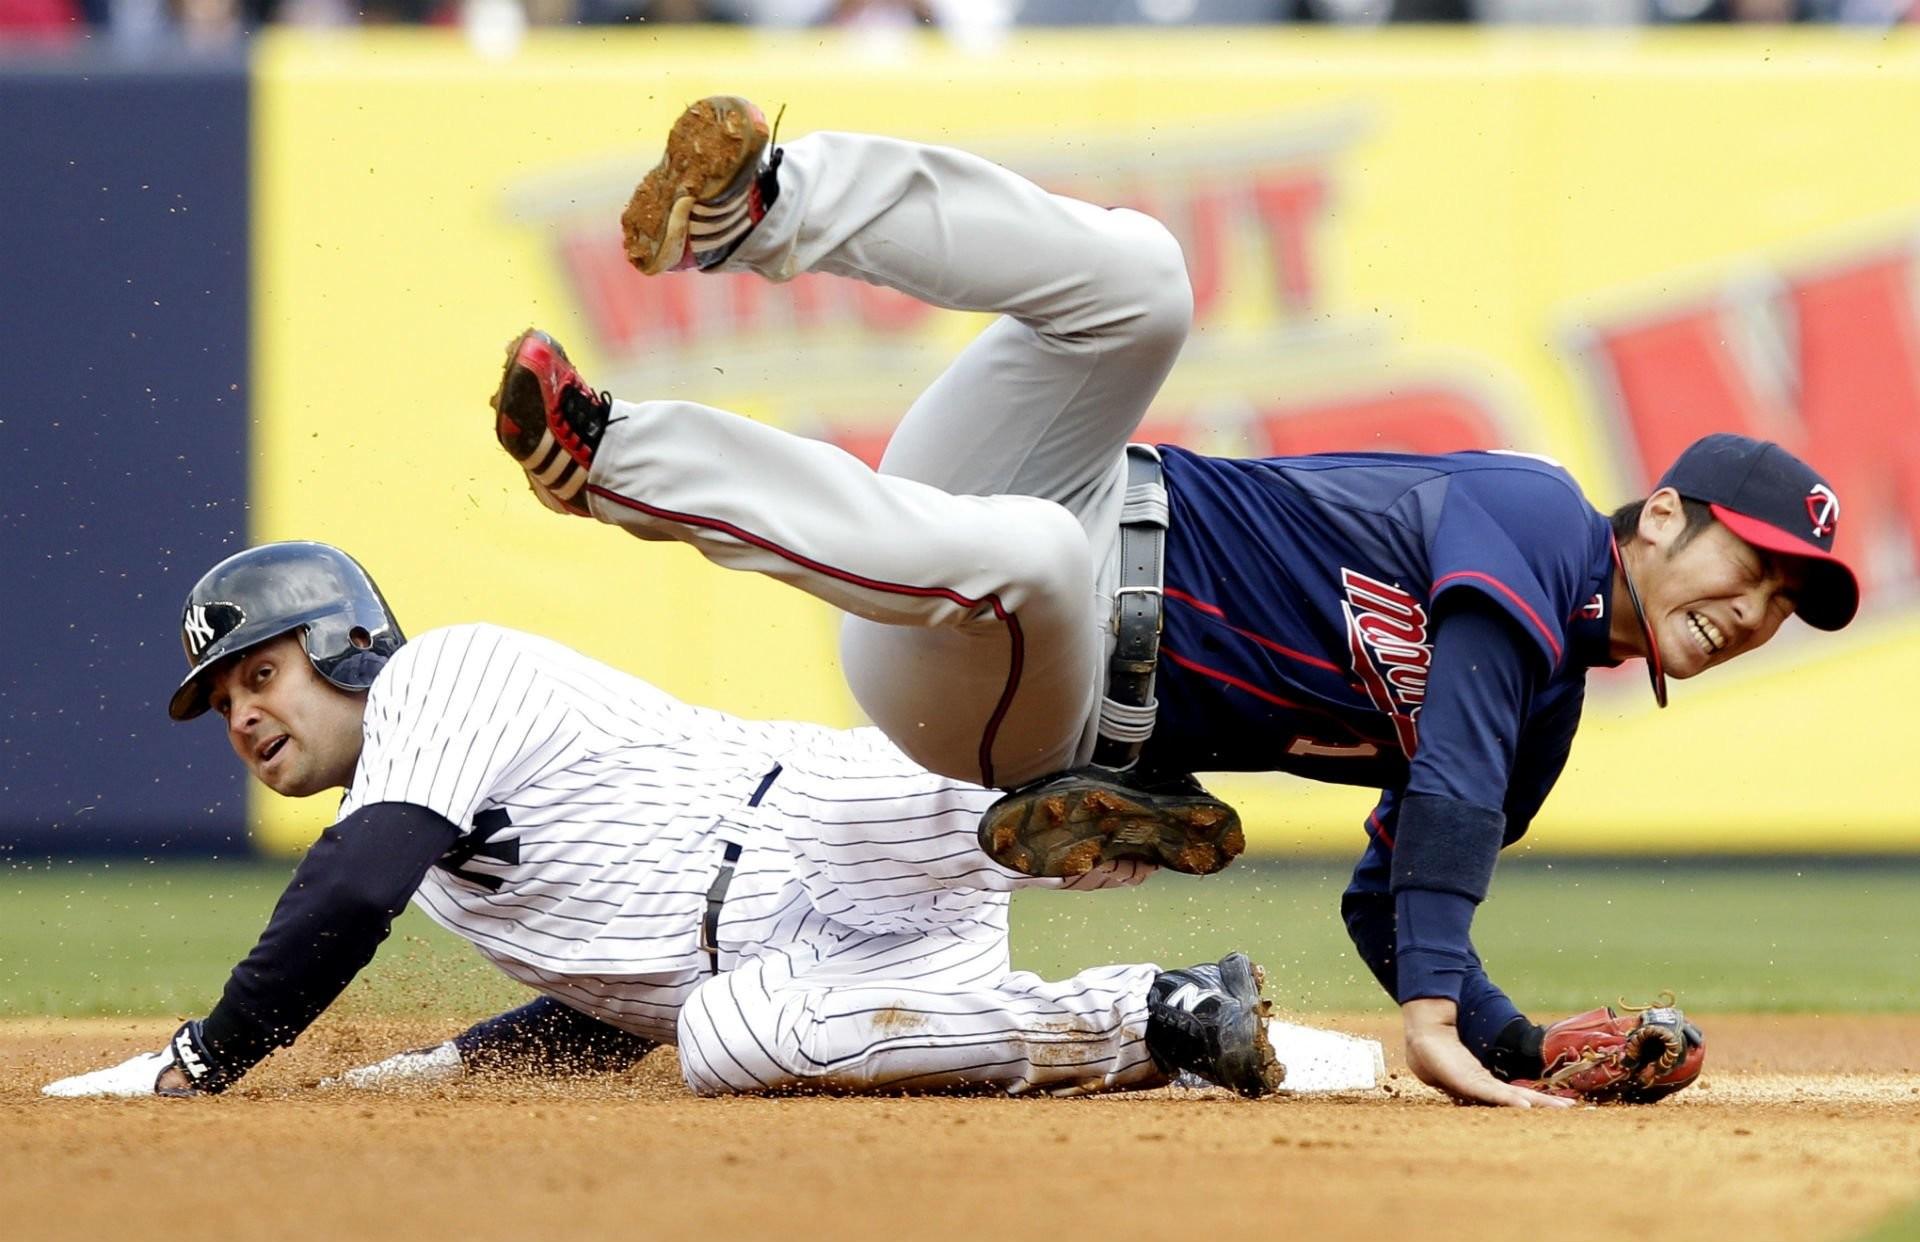 HD Wallpaper | Background ID:315873. Sports New York Yankees